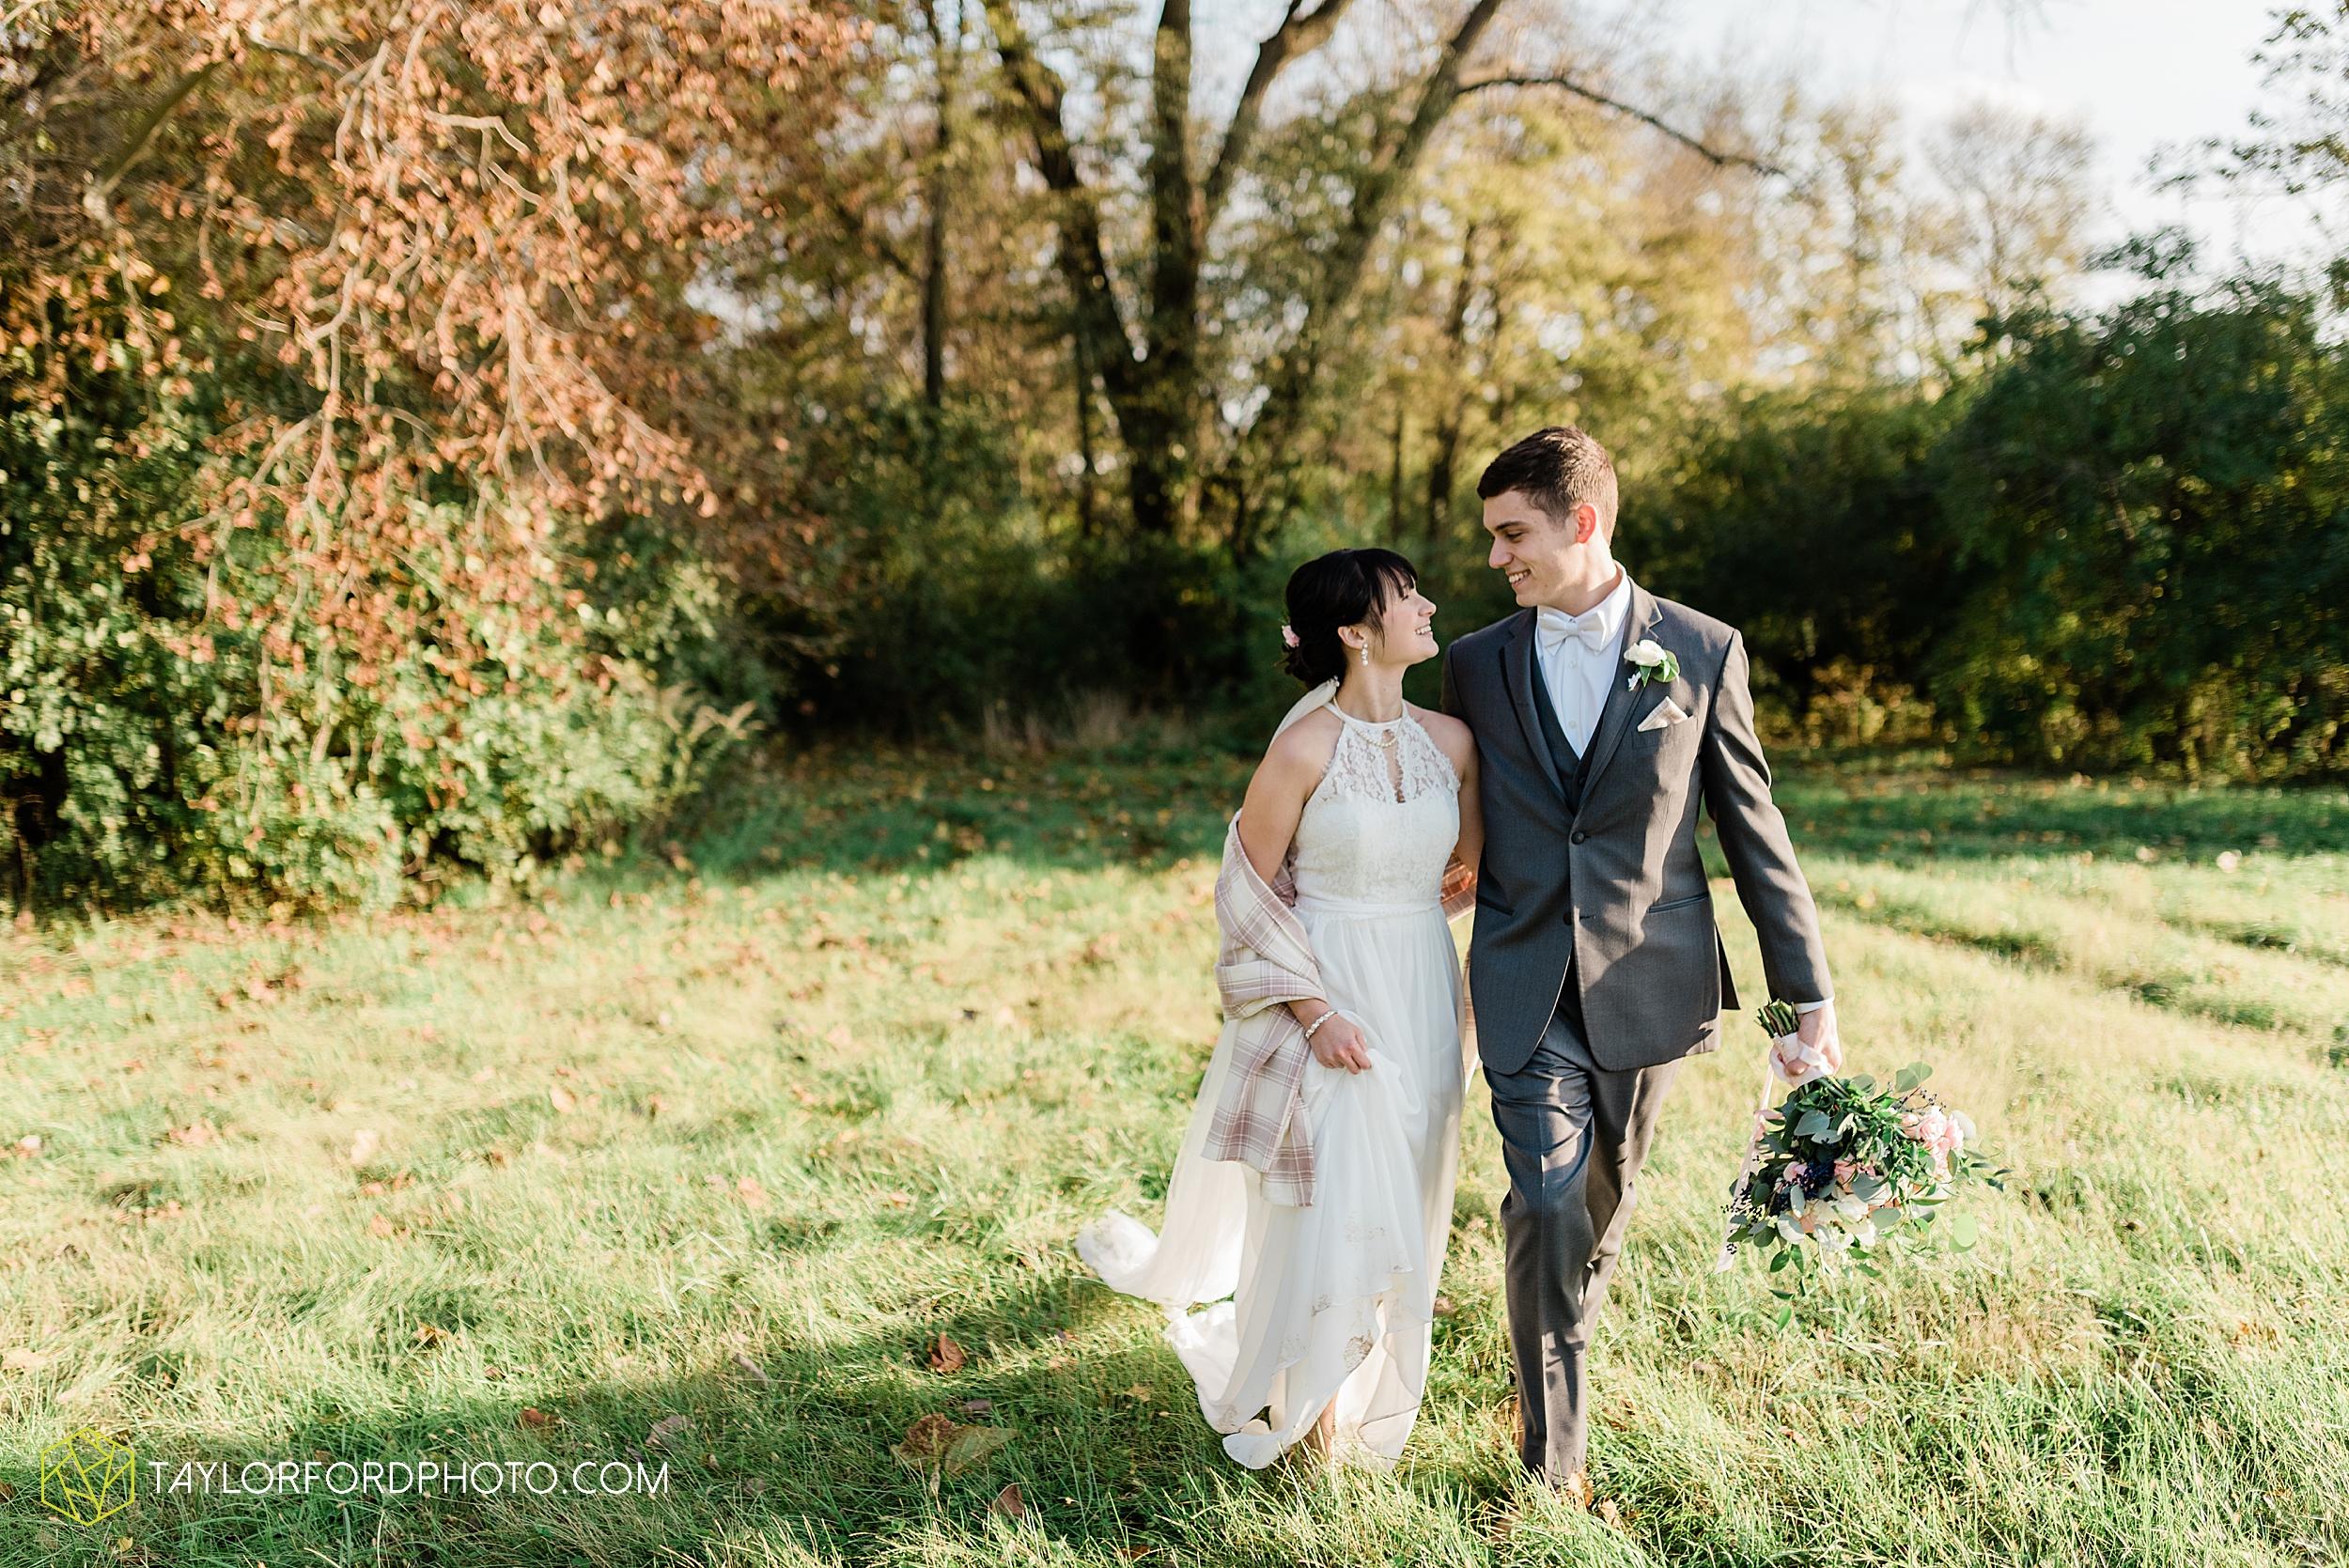 marissa-nicole-nick-daeger-orrmont-estate-farm-wedding-piqua-dayton-troy-ohio-fall-photographer-taylor-ford-photography_1552.jpg